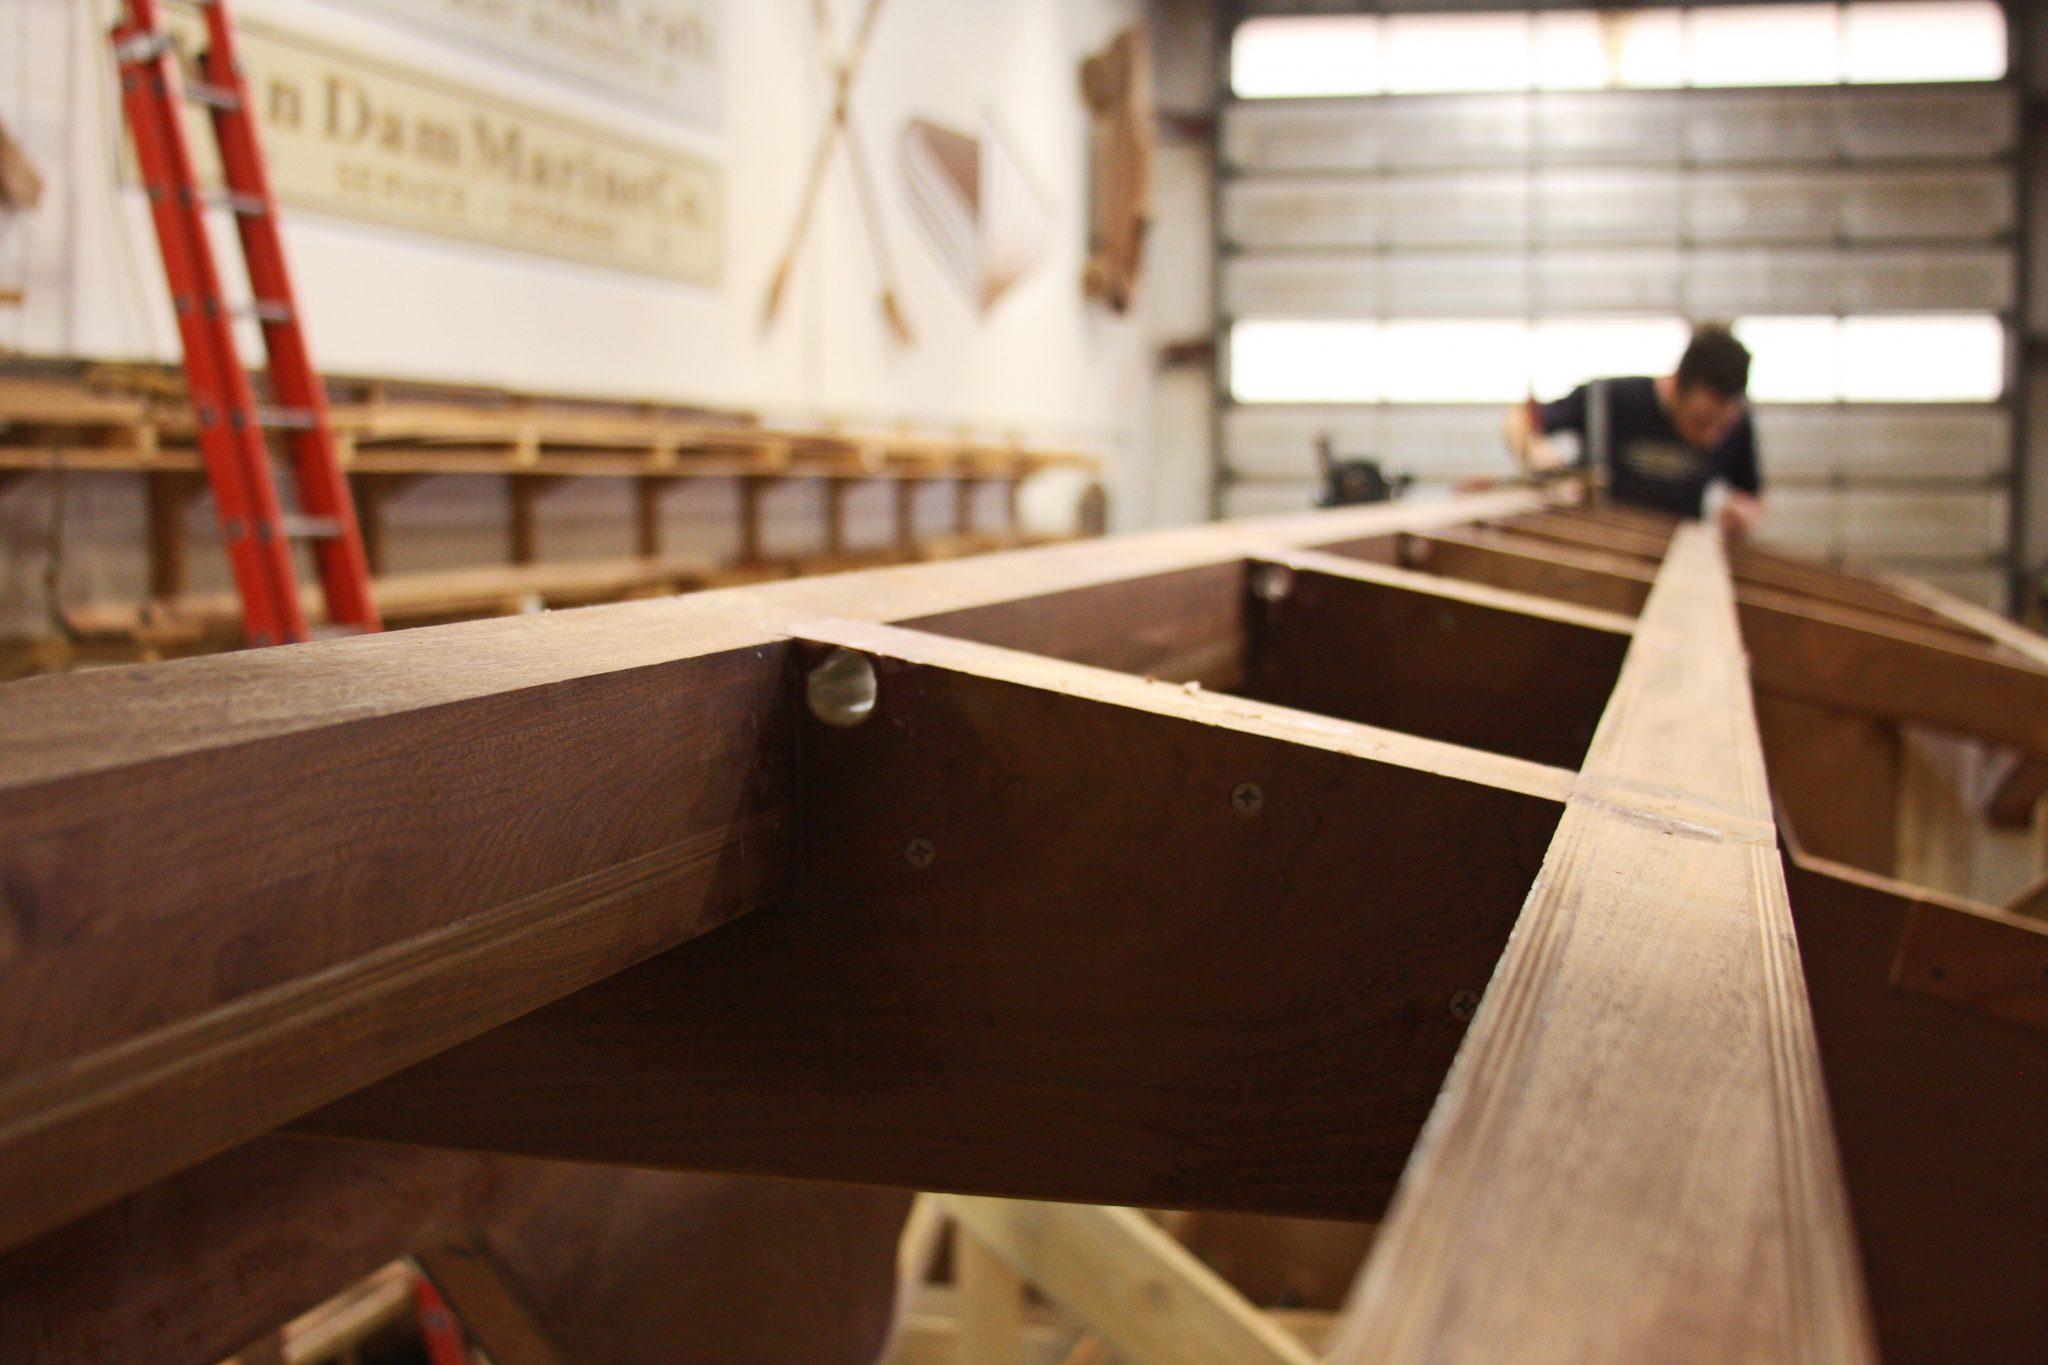 Checking position of mahogany chine